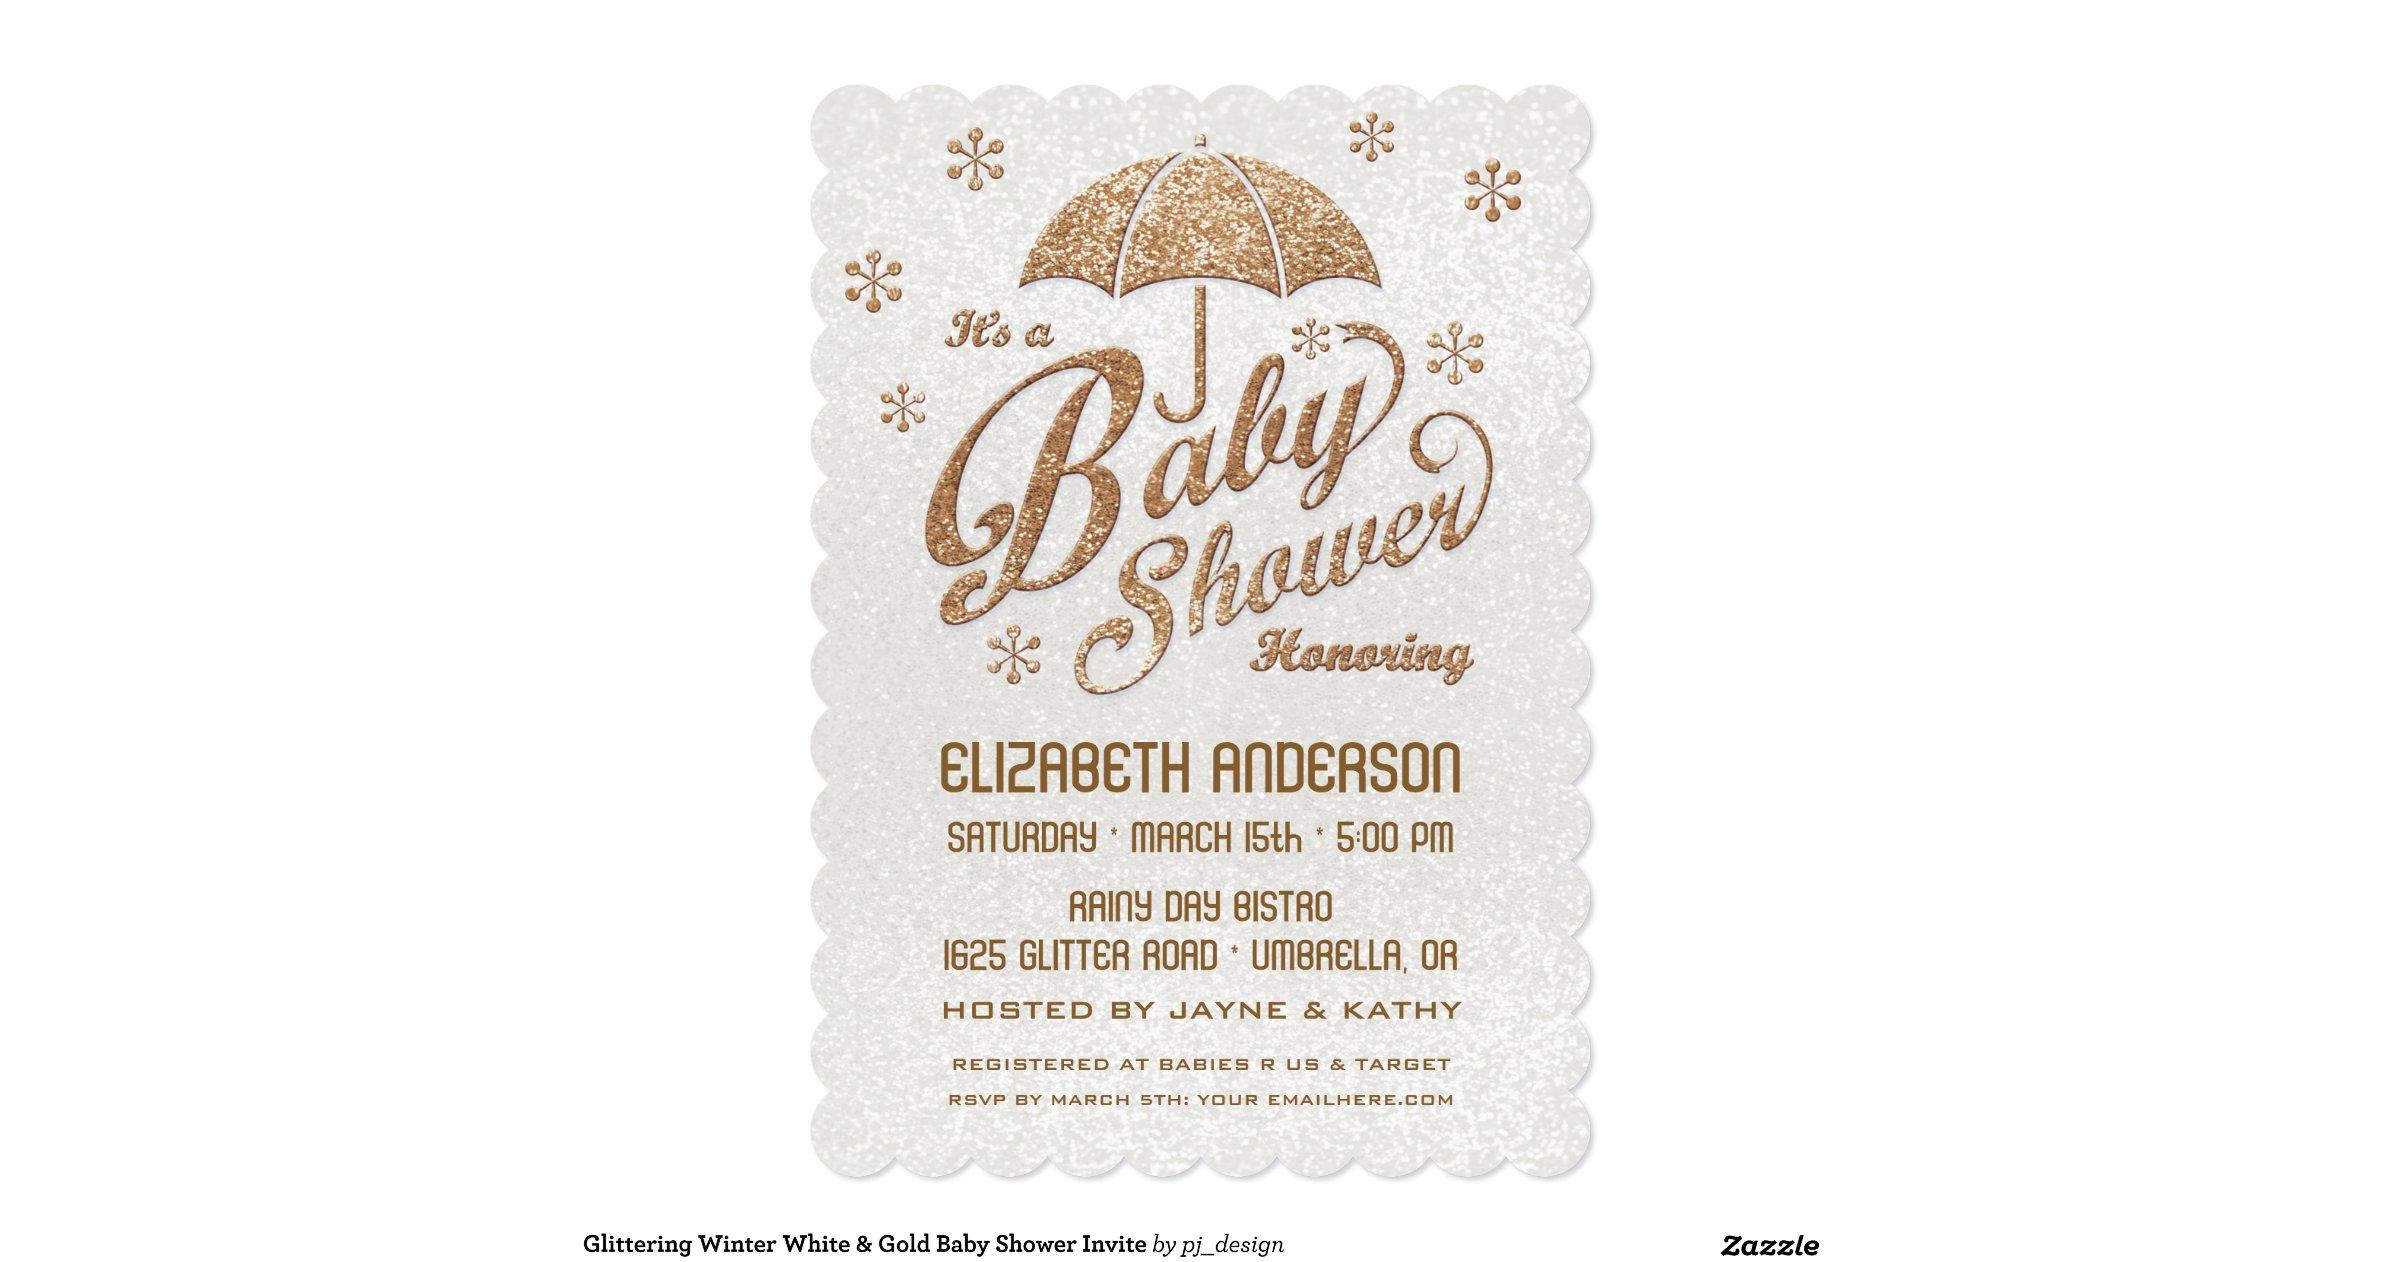 glittering winter white gold baby shower invite